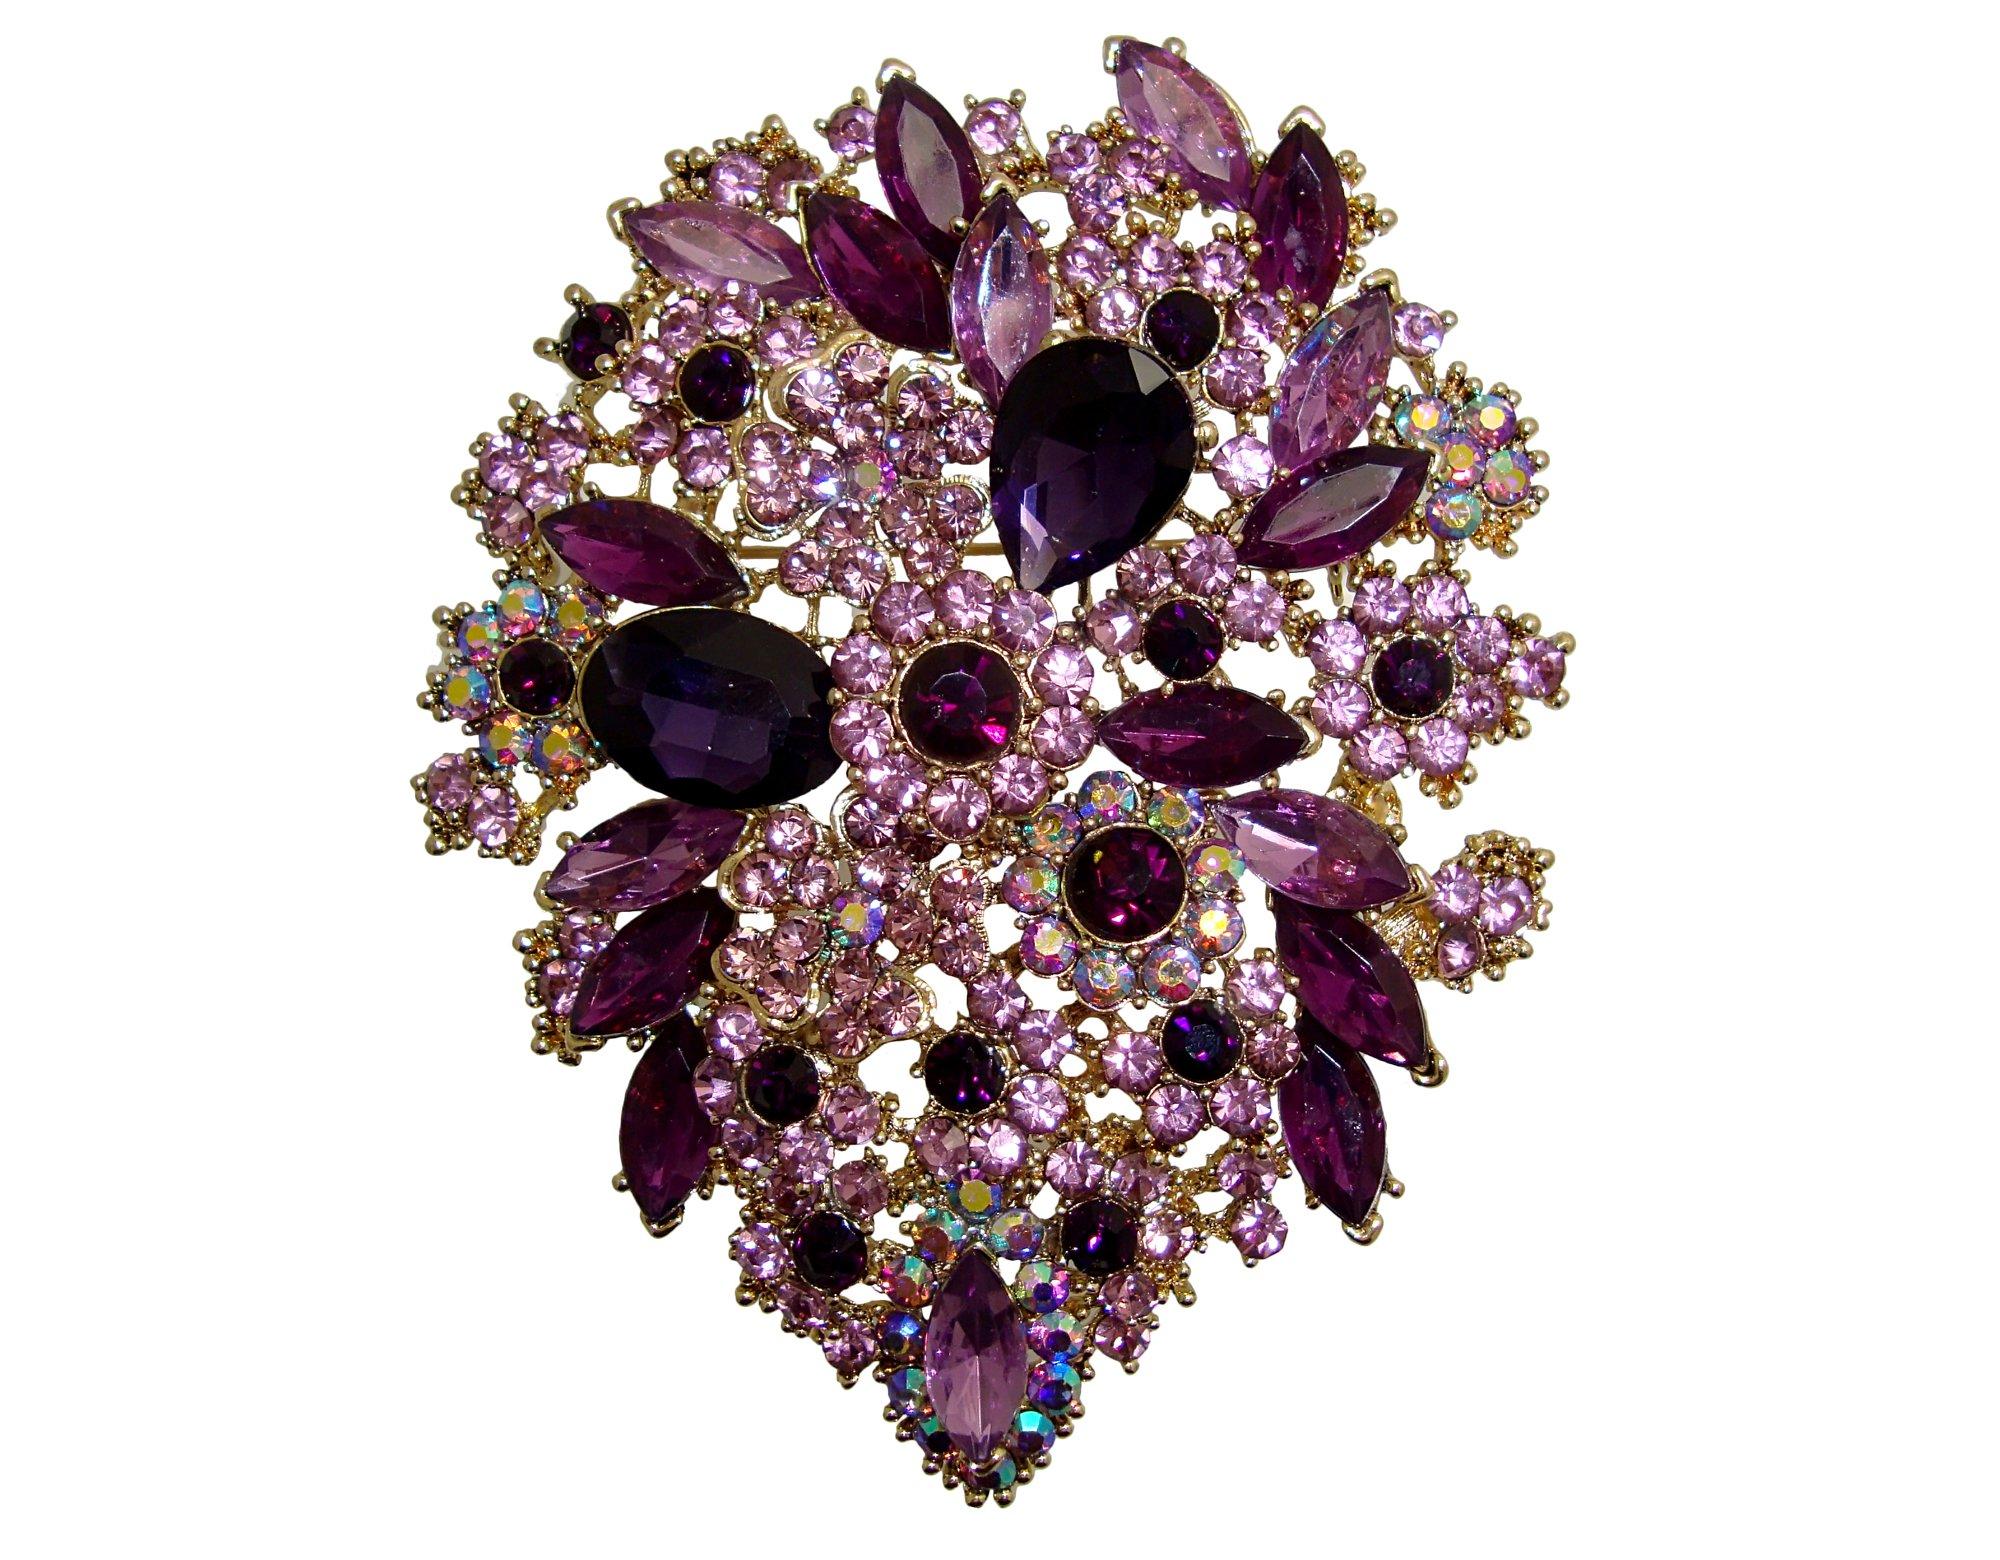 TTjewelry Classic Style Crystal Rhinestone Droplets Flower Art Nouveau Brooch Pins Pendants B10390500 (Amethyst)